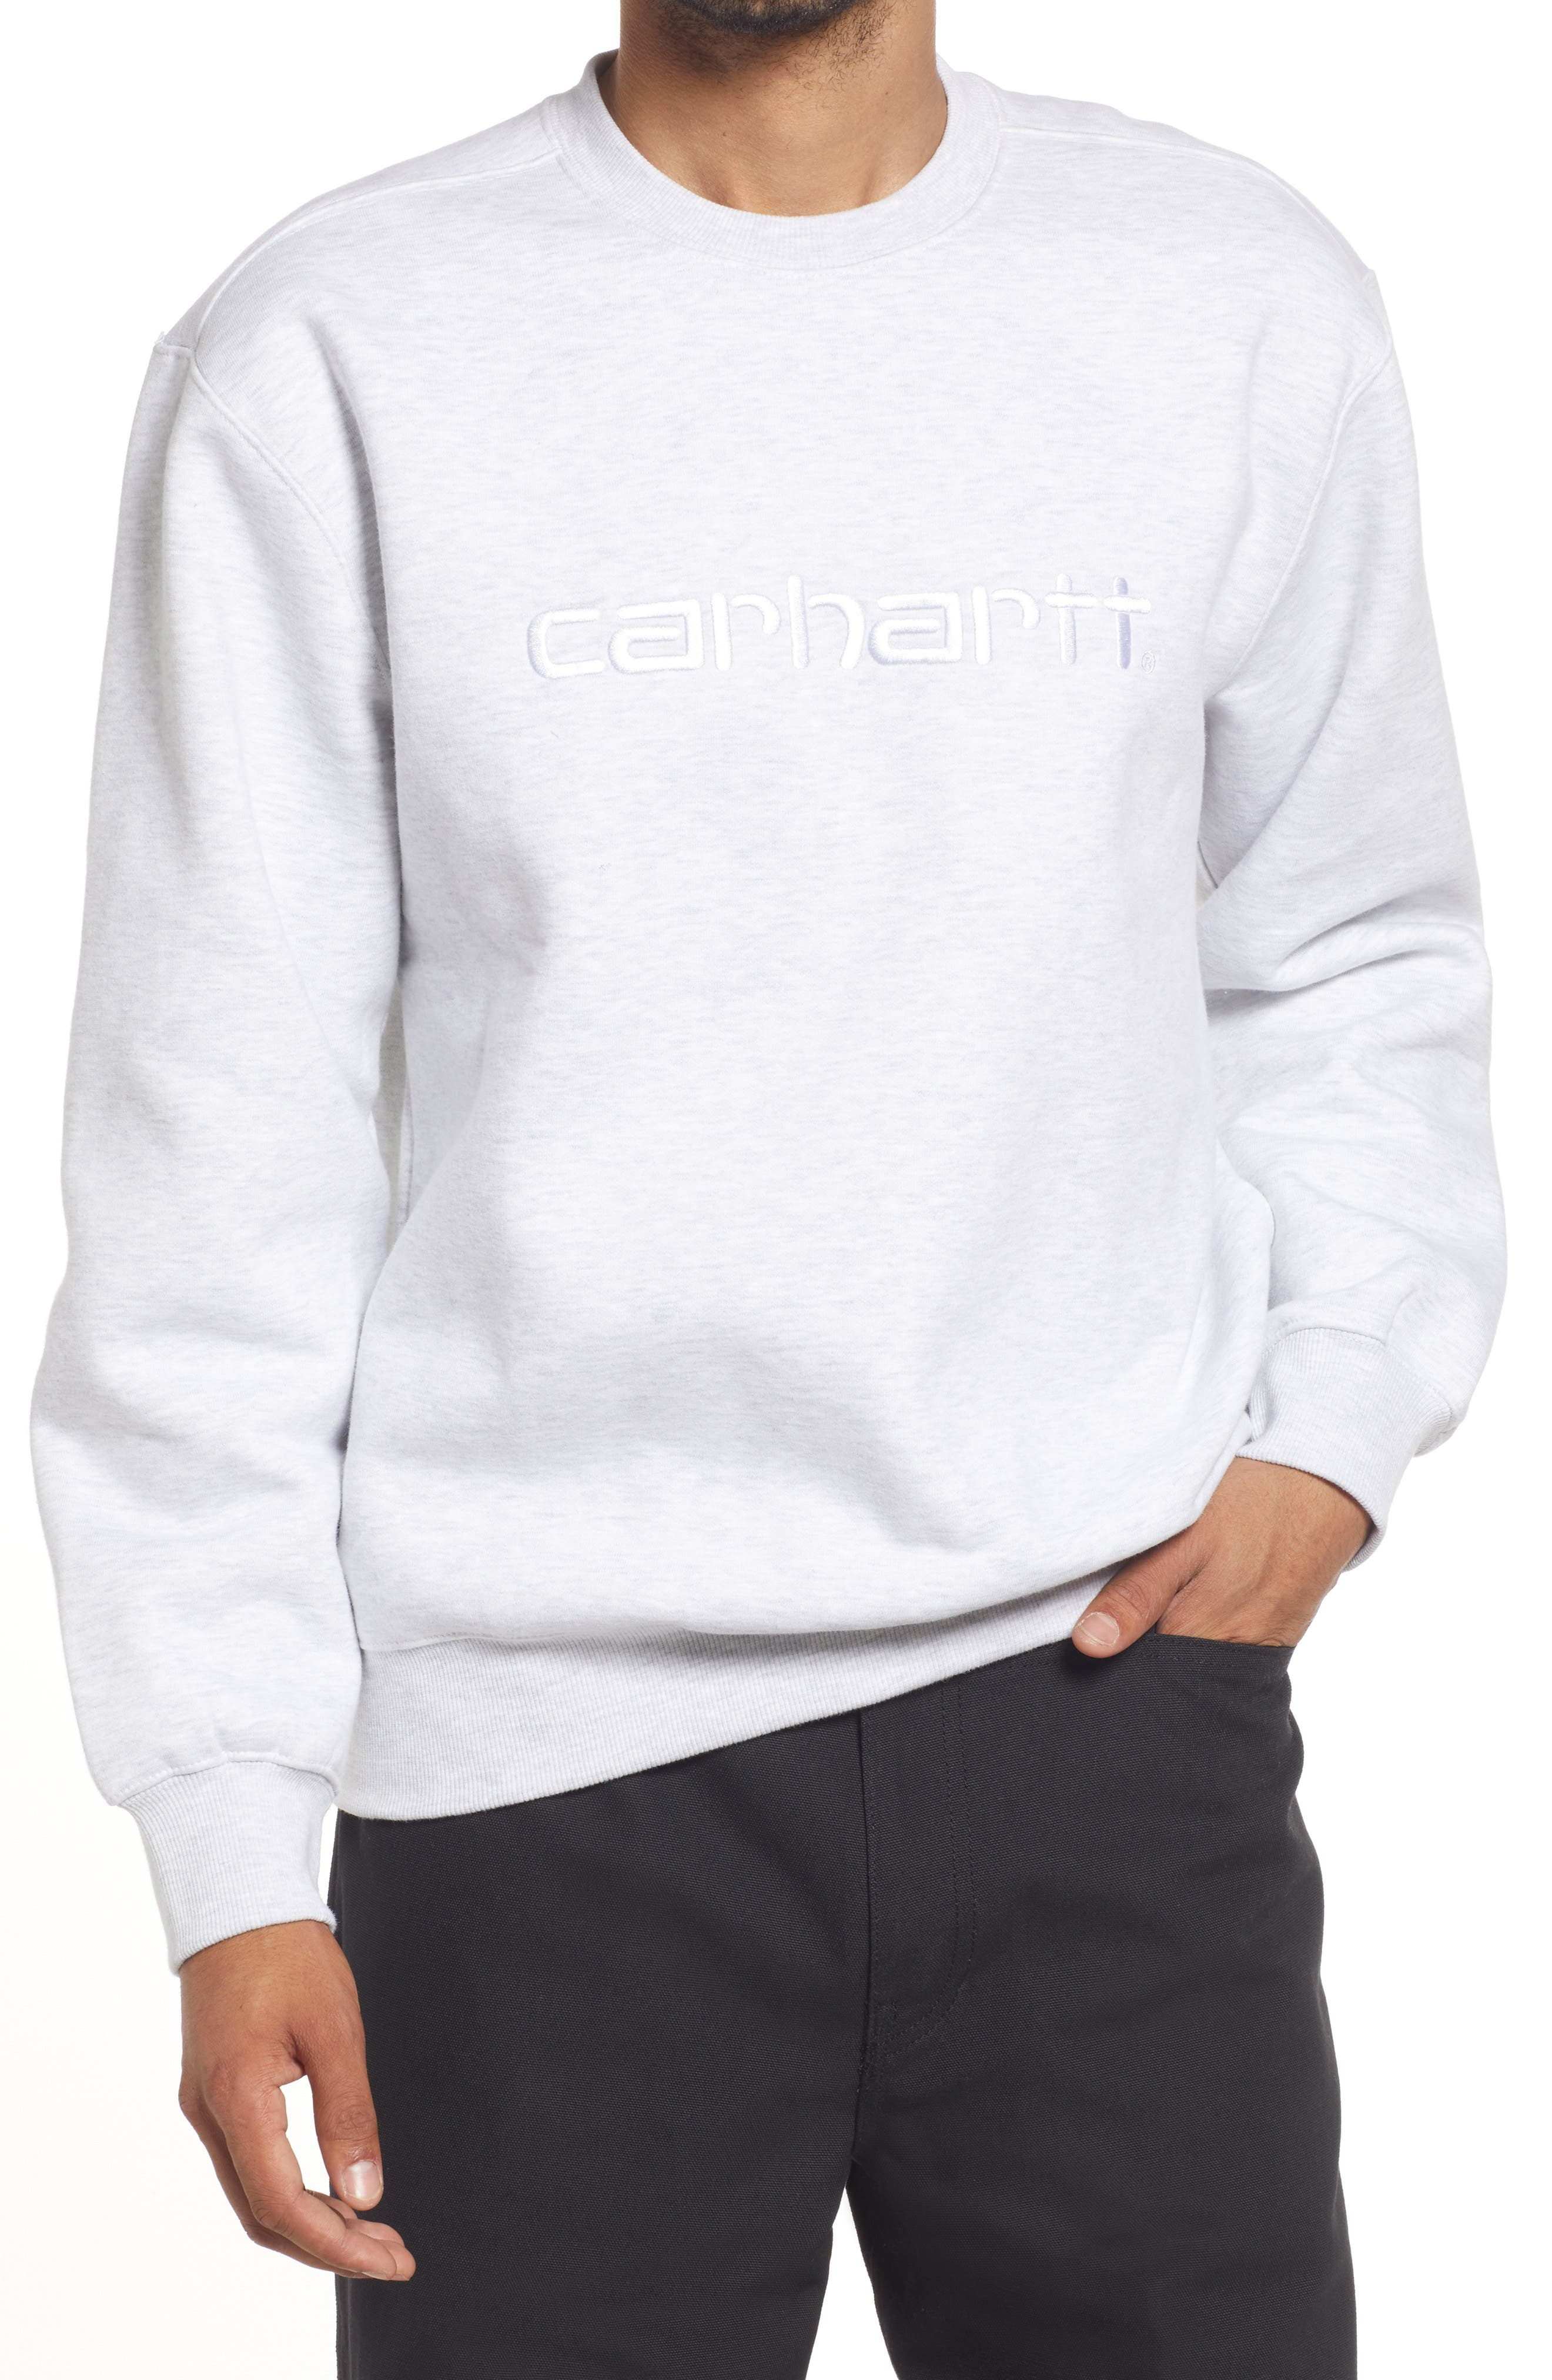 Men's Cotton Blend Crewneck Sweatshirt